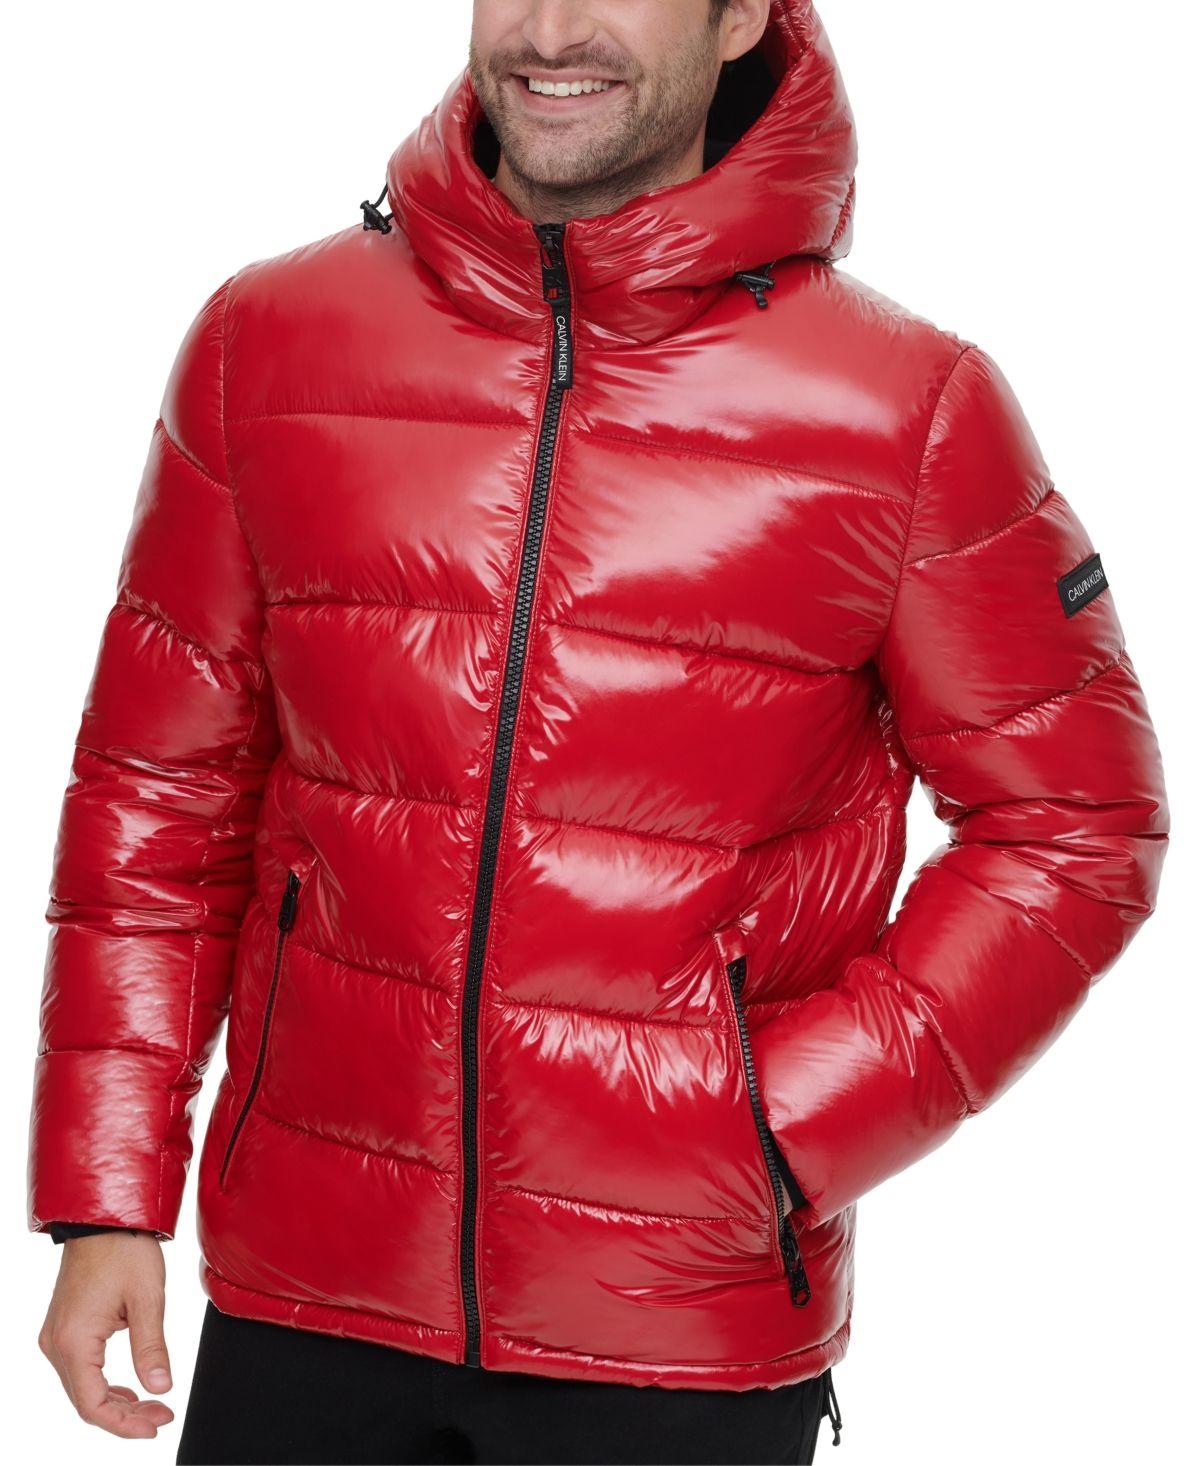 Calvin Klein Men S High Shine Puffer Jacket Reviews Coats Jackets Men Macy S In 2021 Calvin Klein Men Calvin Klein Jackets [ 1466 x 1200 Pixel ]